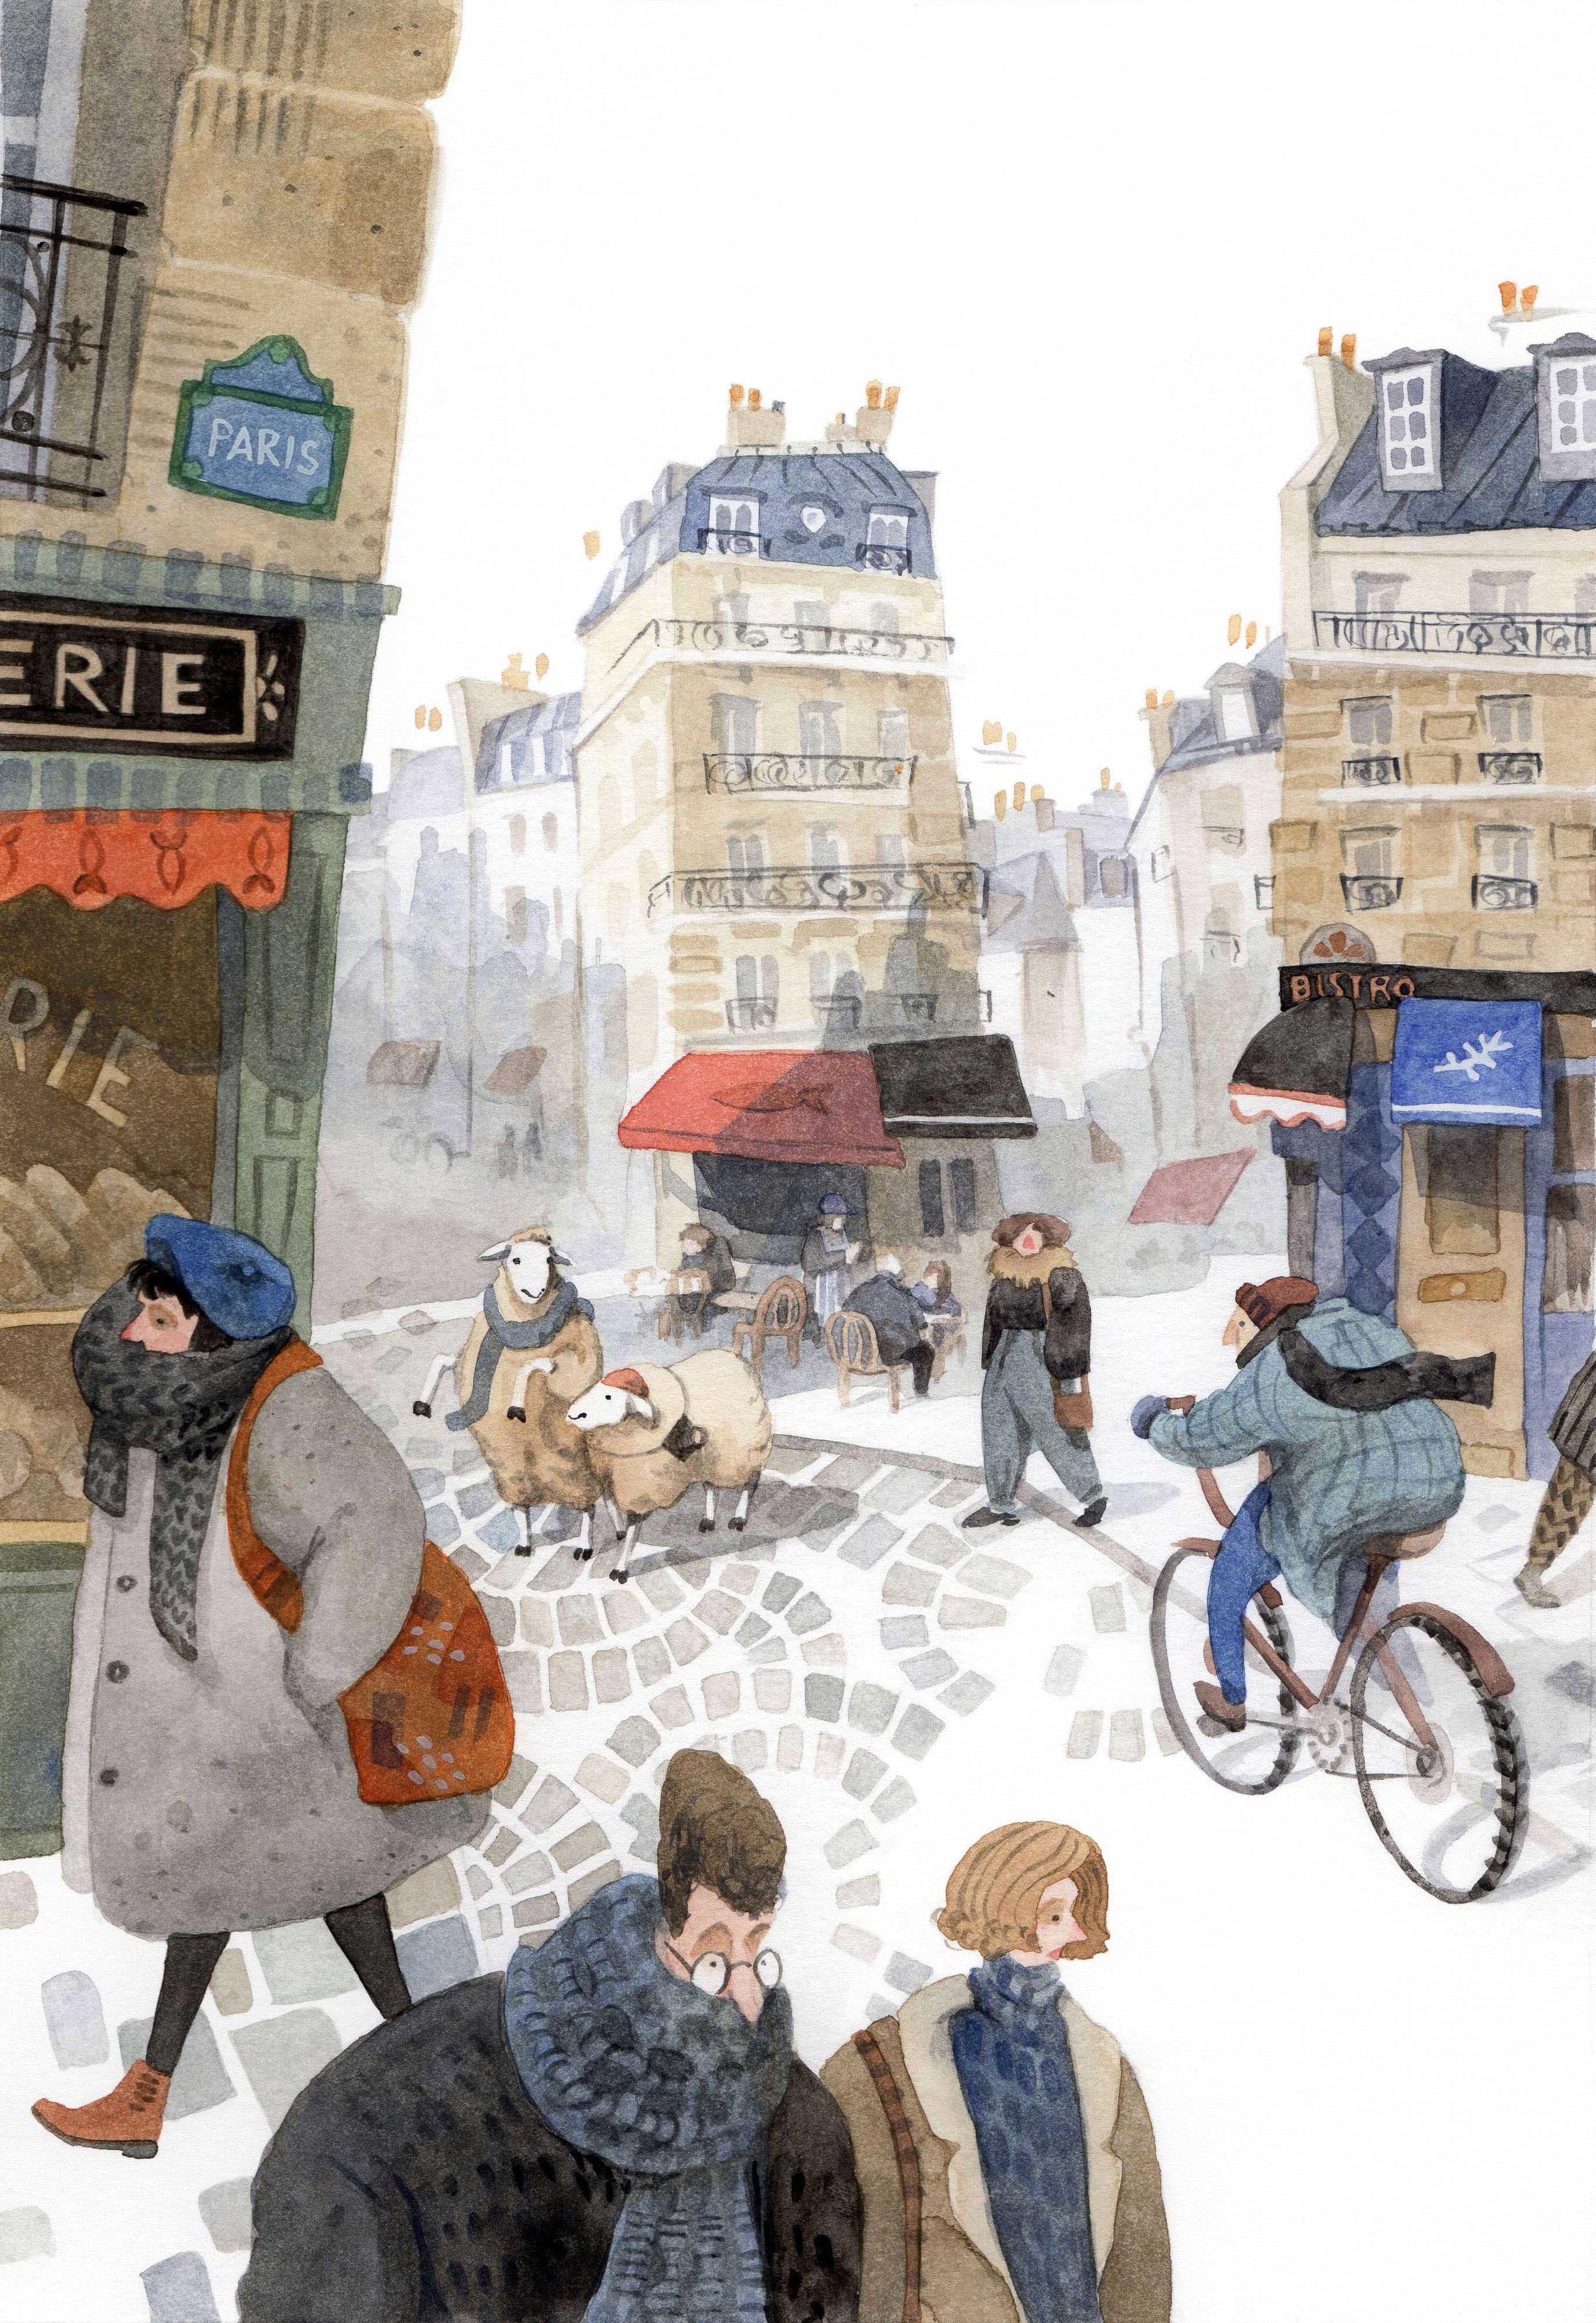 Lost sheep in Paris, Priscilla Tey, Illustration Art